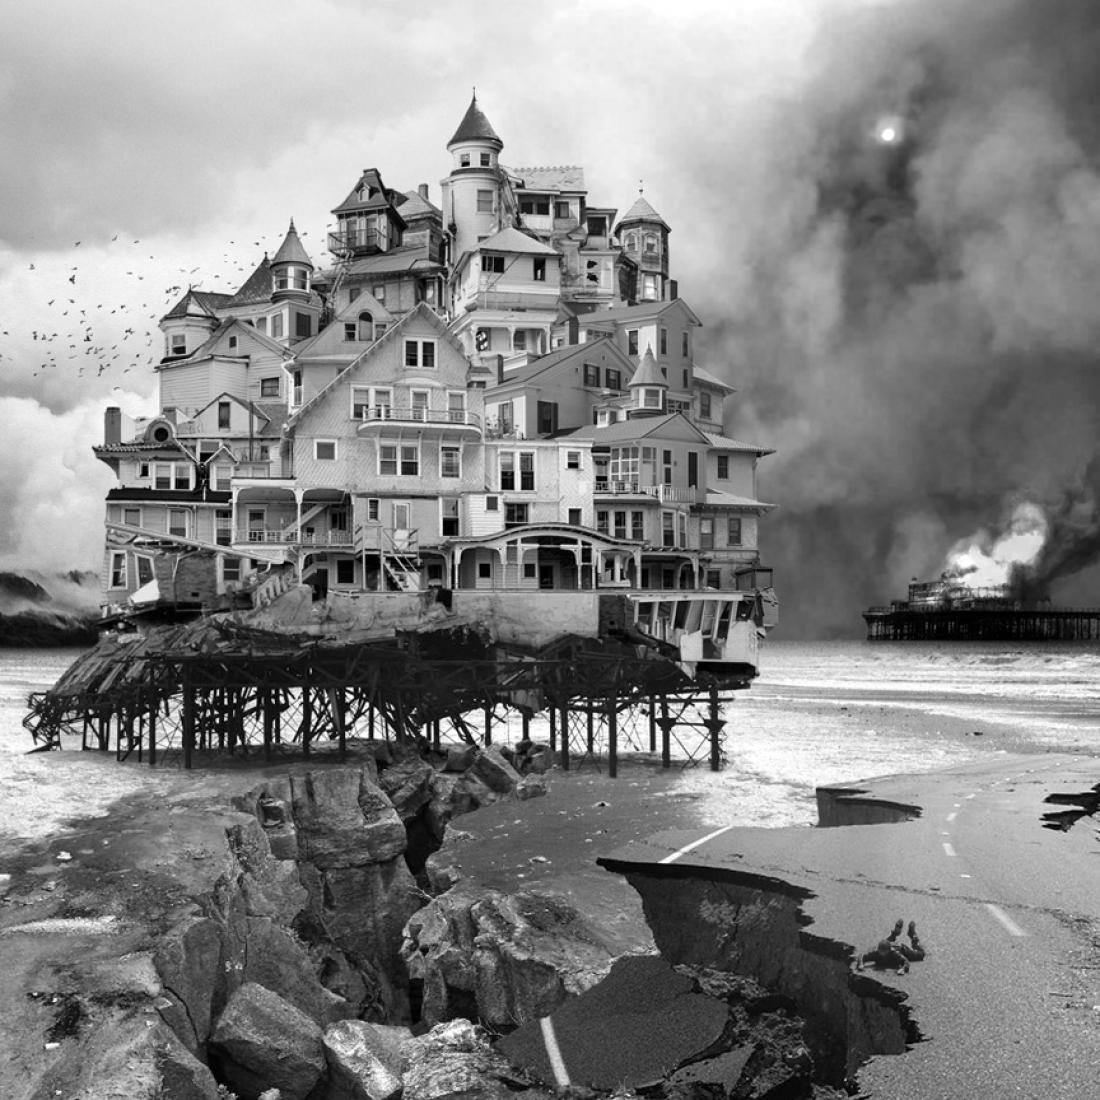 Untitled (house), 2006. Aberrations, por Jim Kazanjian.